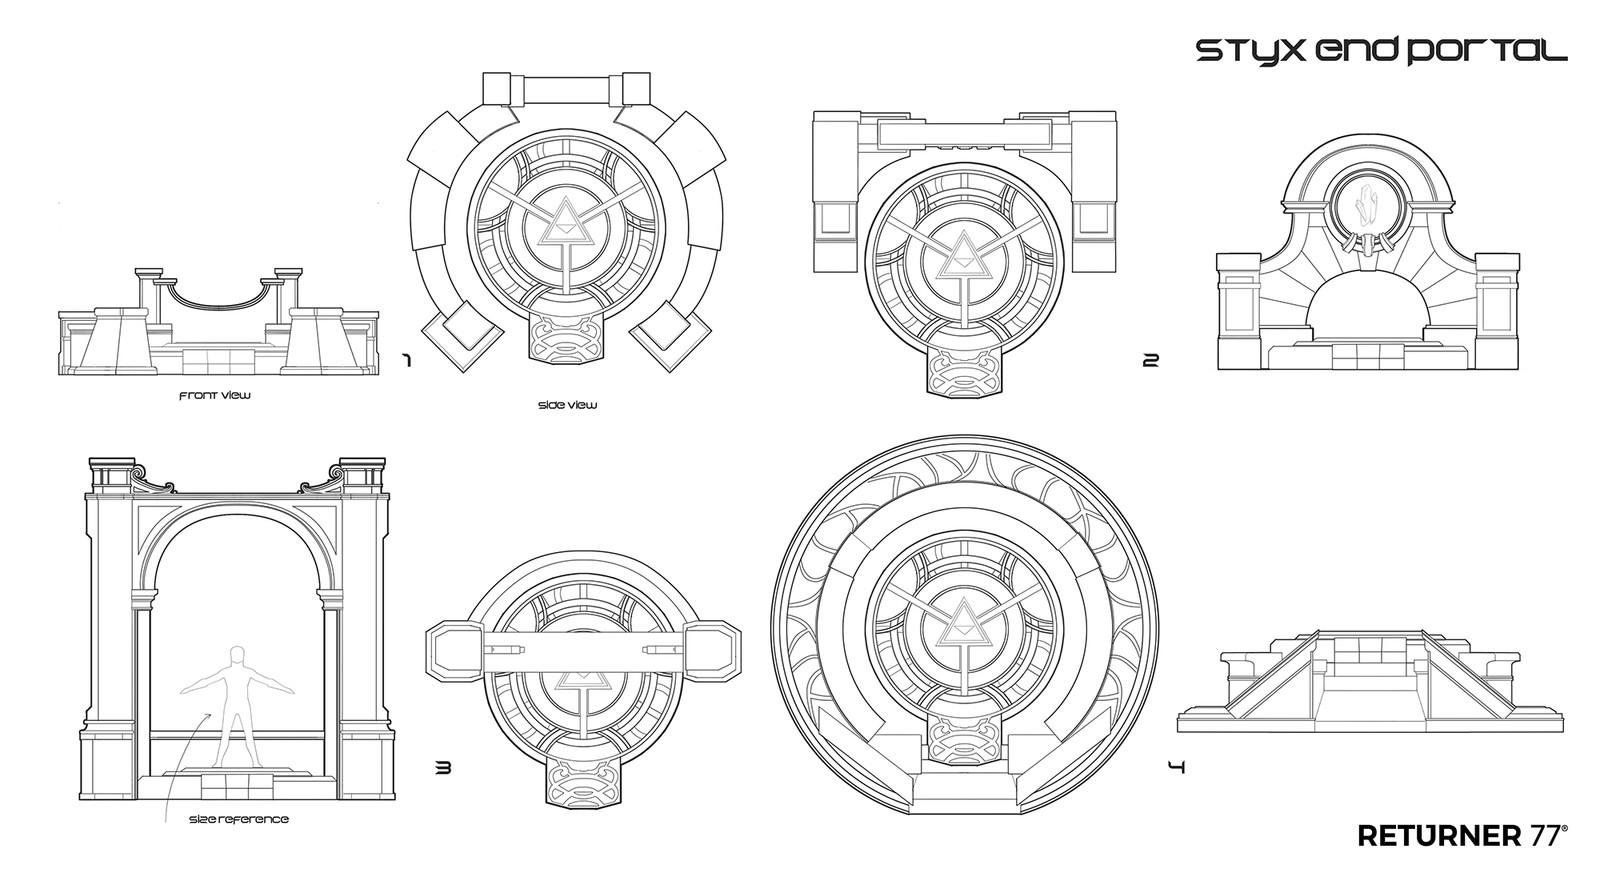 Returner 77 concept art